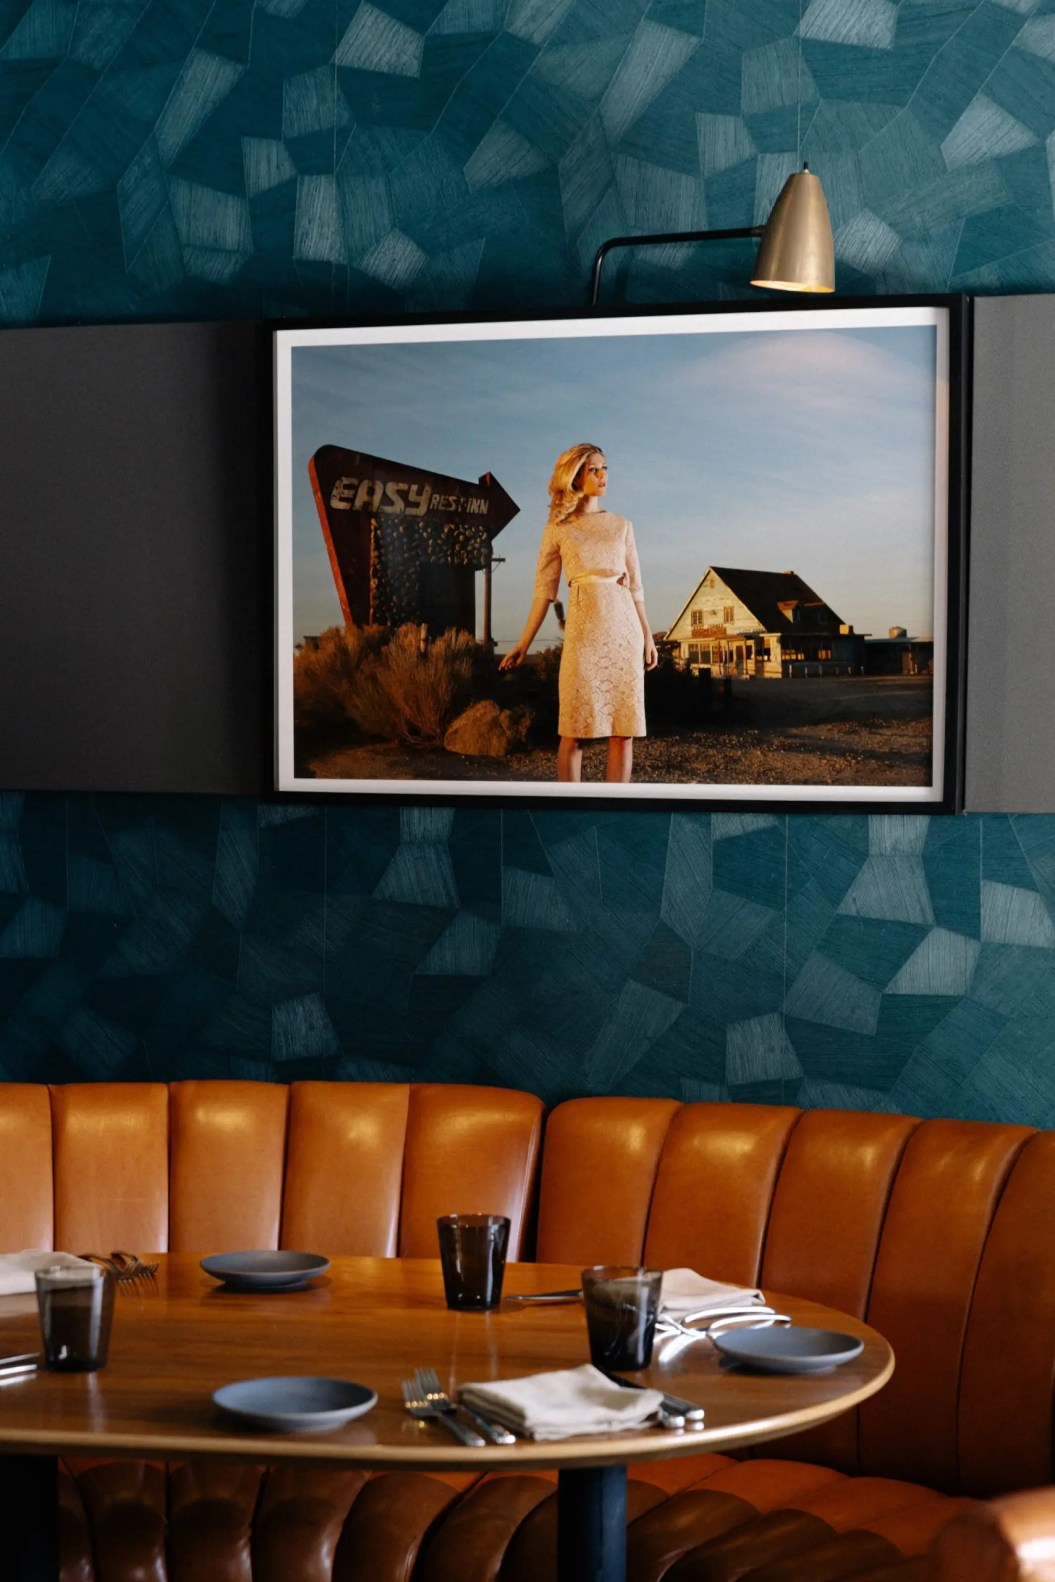 Nick + Stef's Steakhouse_Modern dining room at Nick + Stef's Steakhouse-min